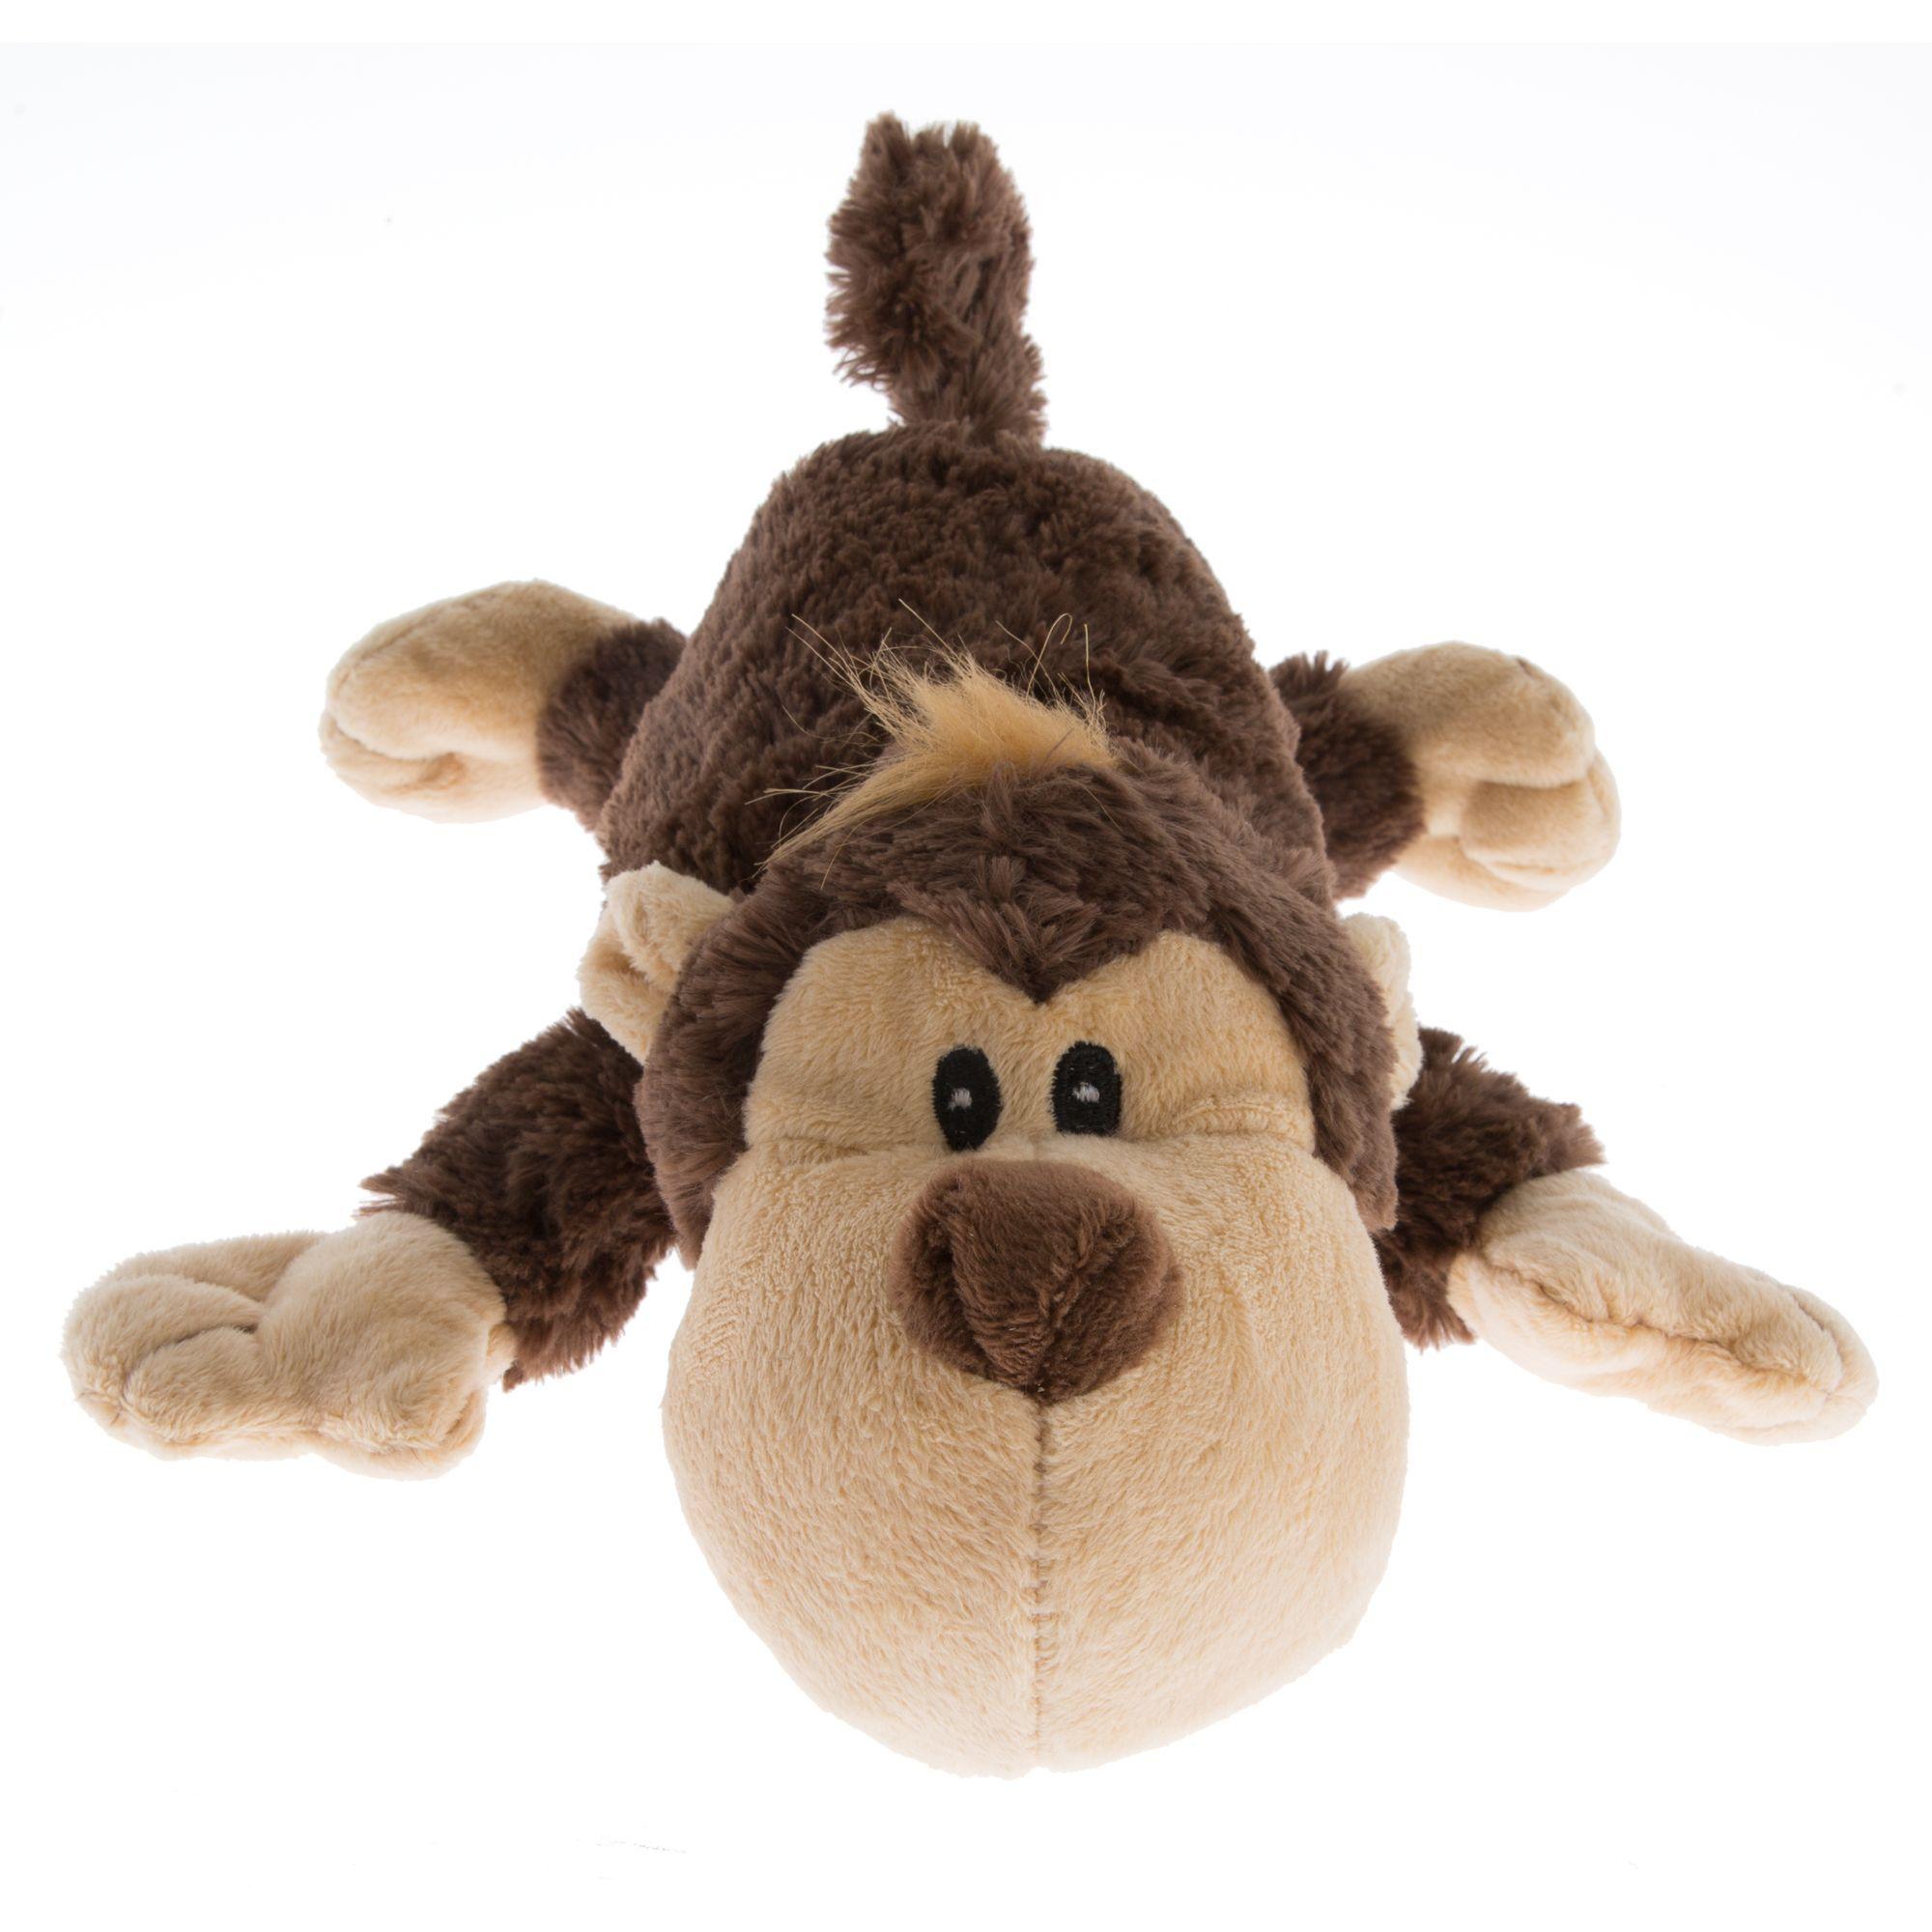 KONG® Cozie Spunky Monkey Dog Toy in 2020 Best dog toys